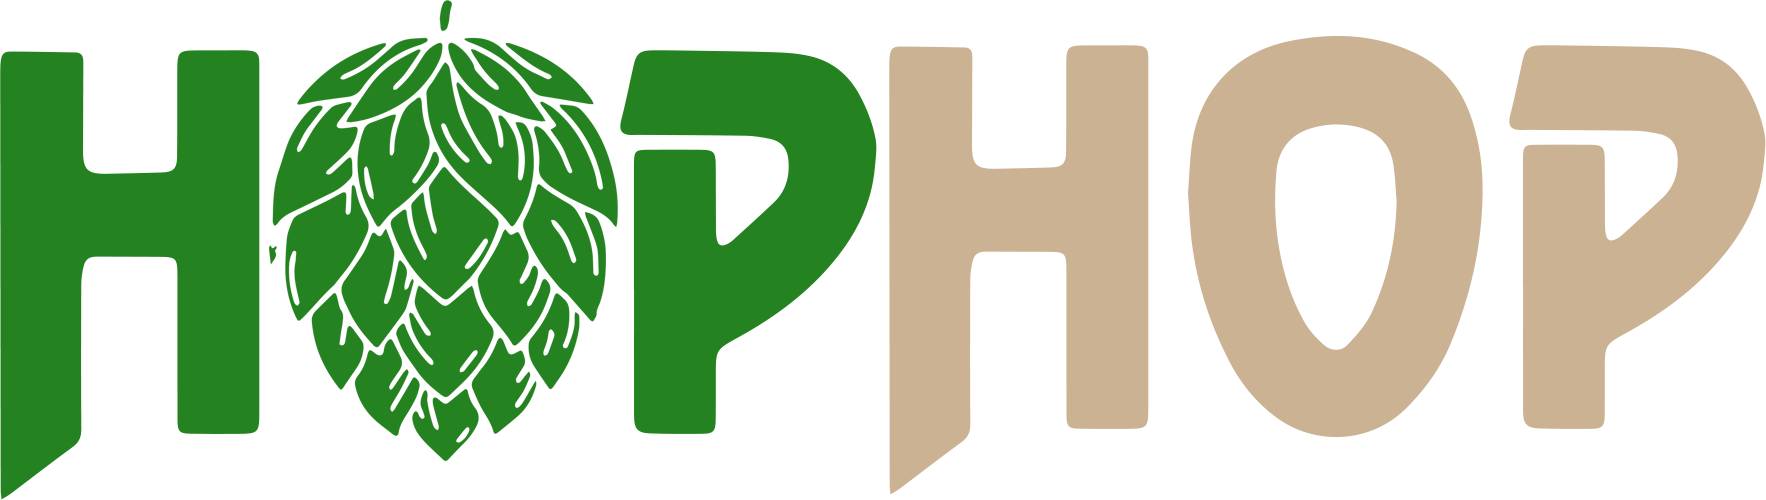 Hophopshirt